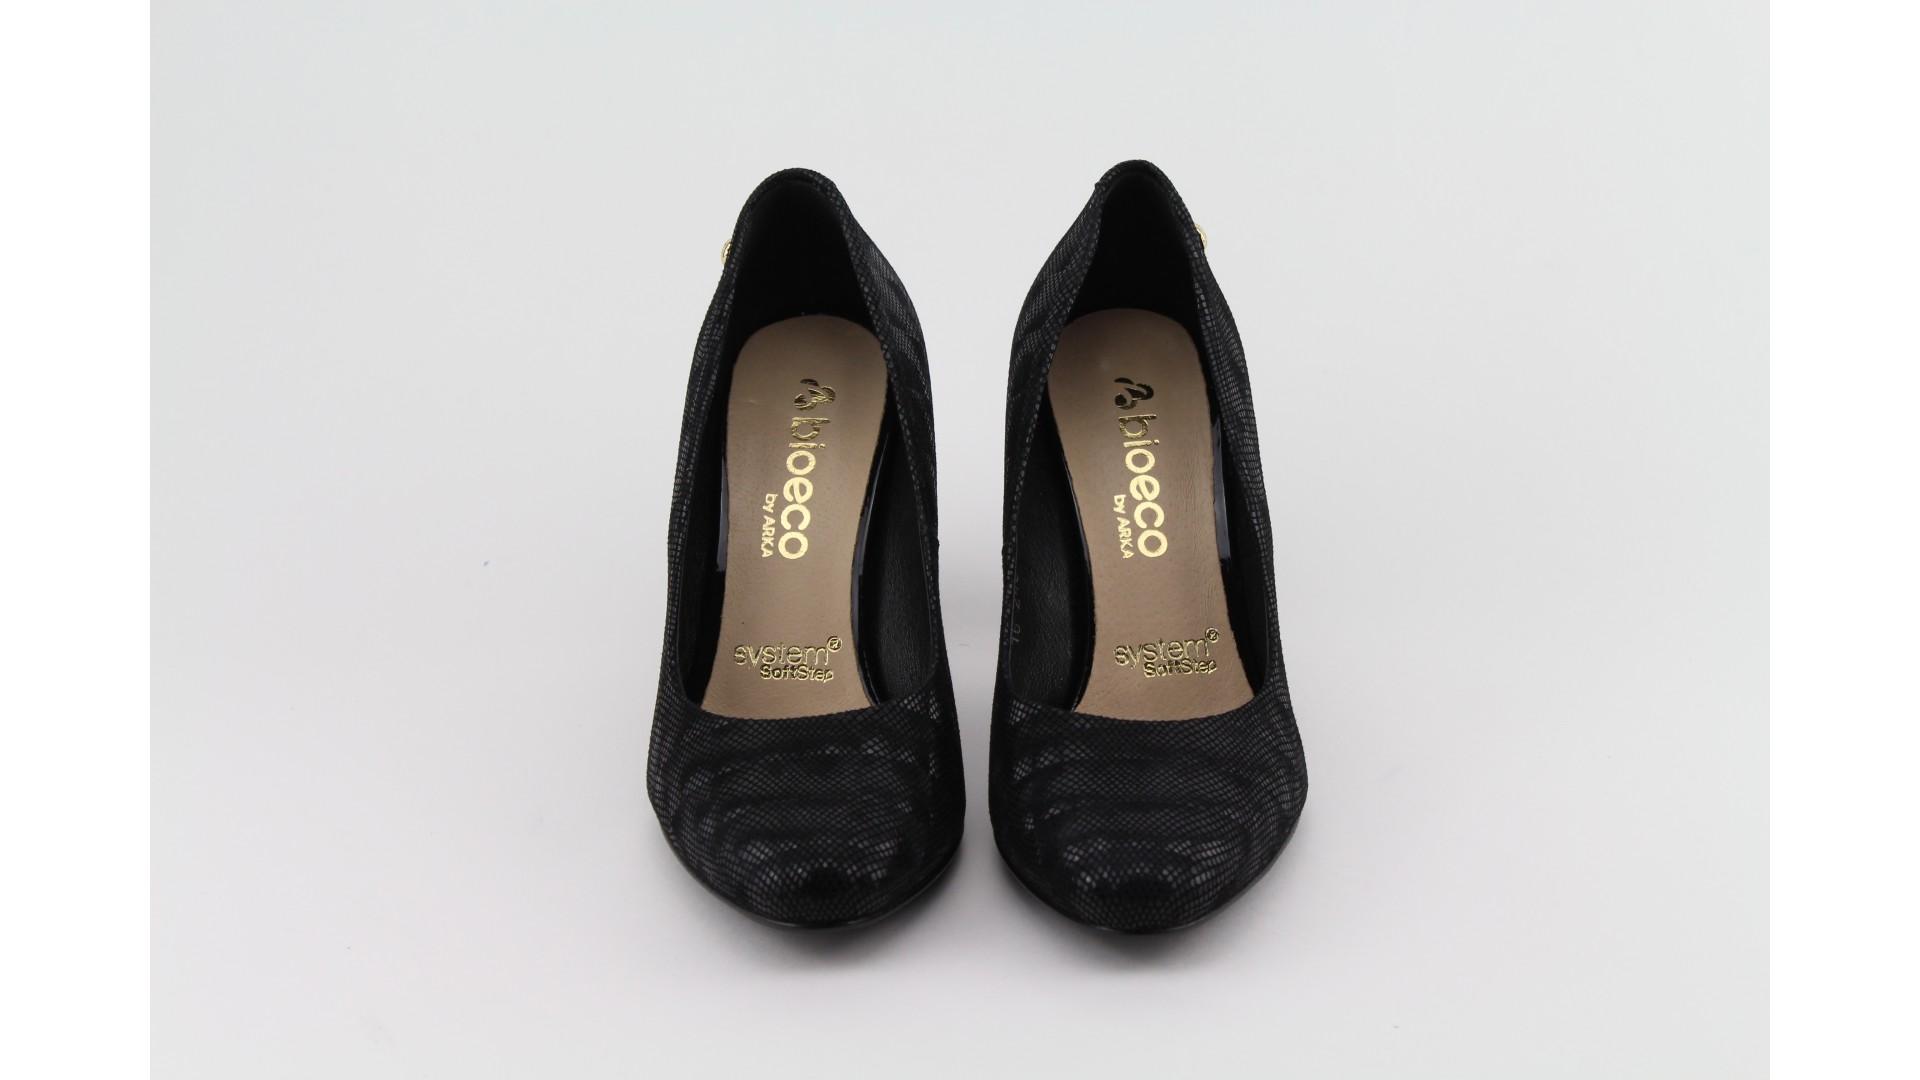 94c5430e972f Bioeco fekete magassarkú cipő